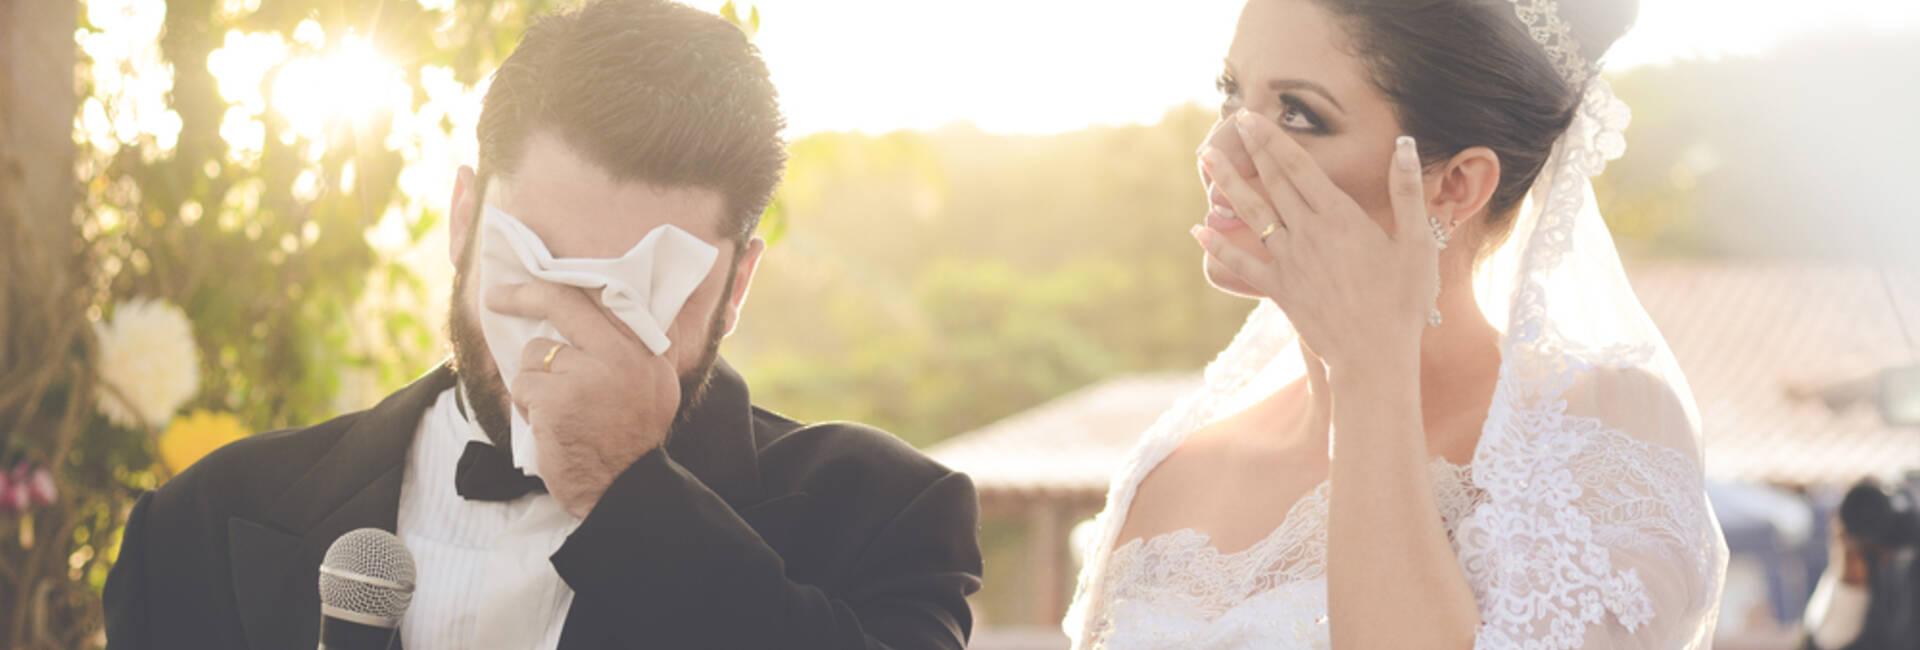 Casamento de Bruna e José Jr